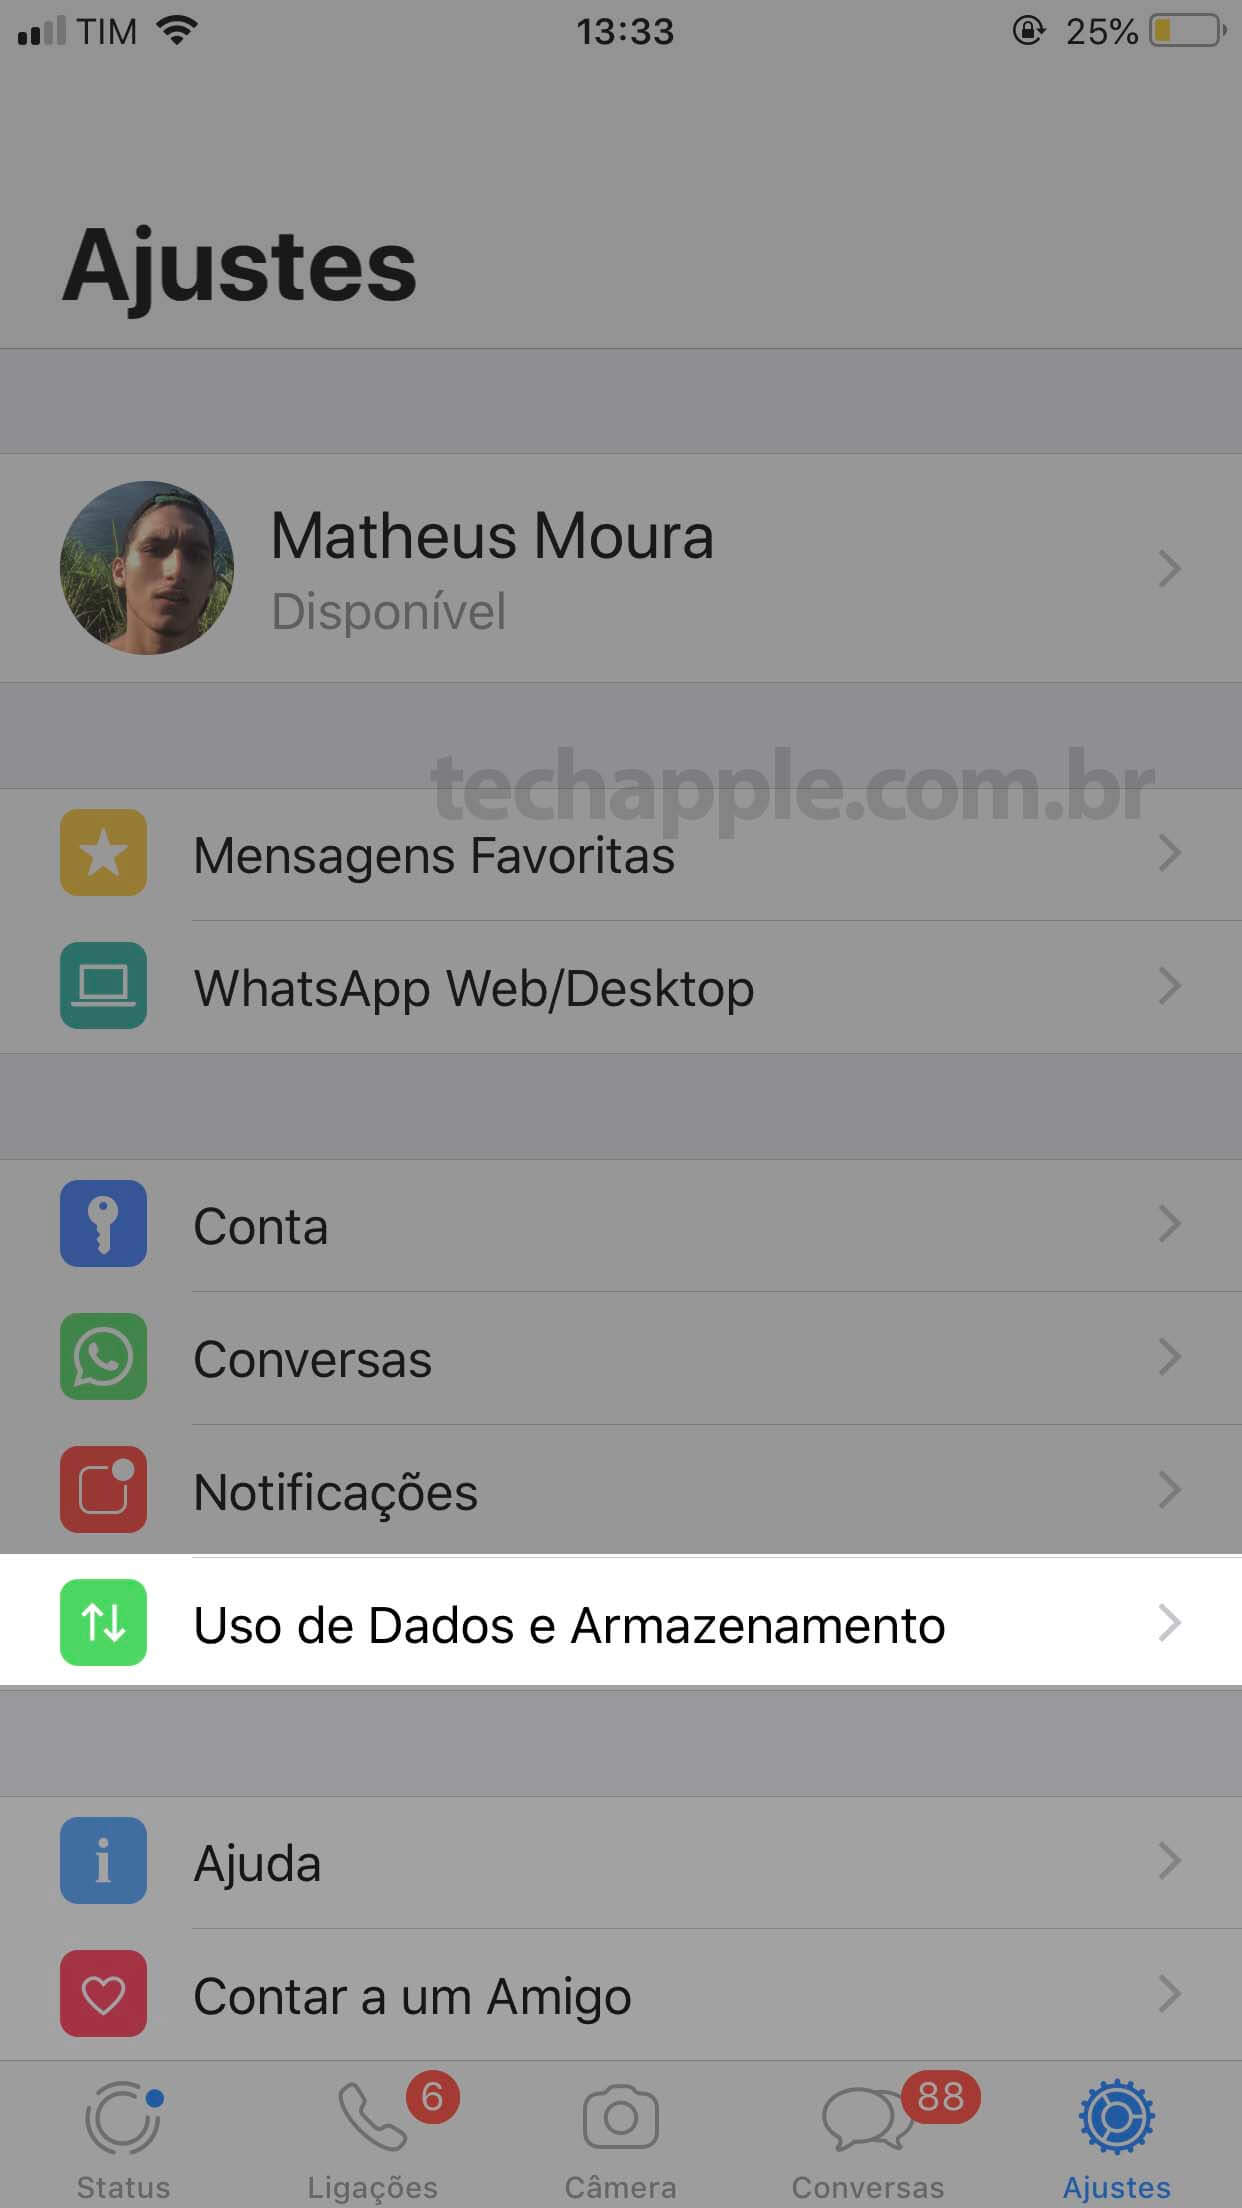 WhatsApp Ajustes - TechApple.com.br